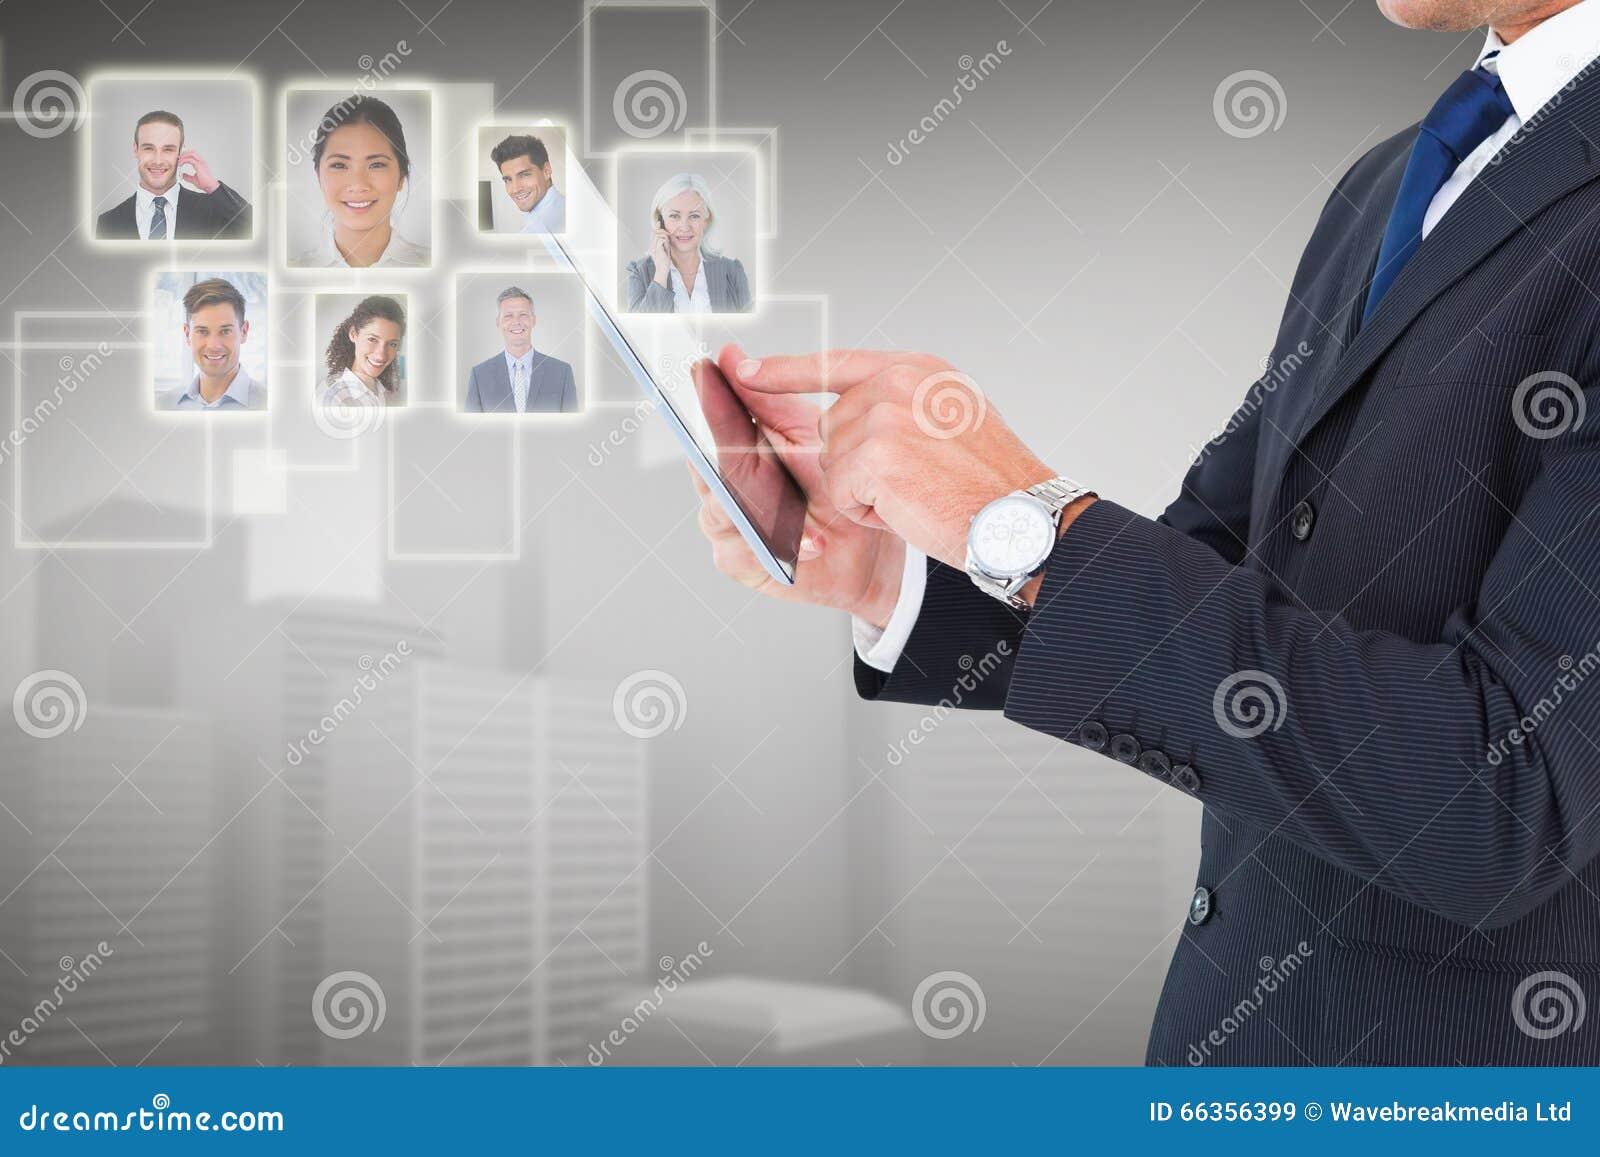 Composite image of businessman in suit using digital tablet